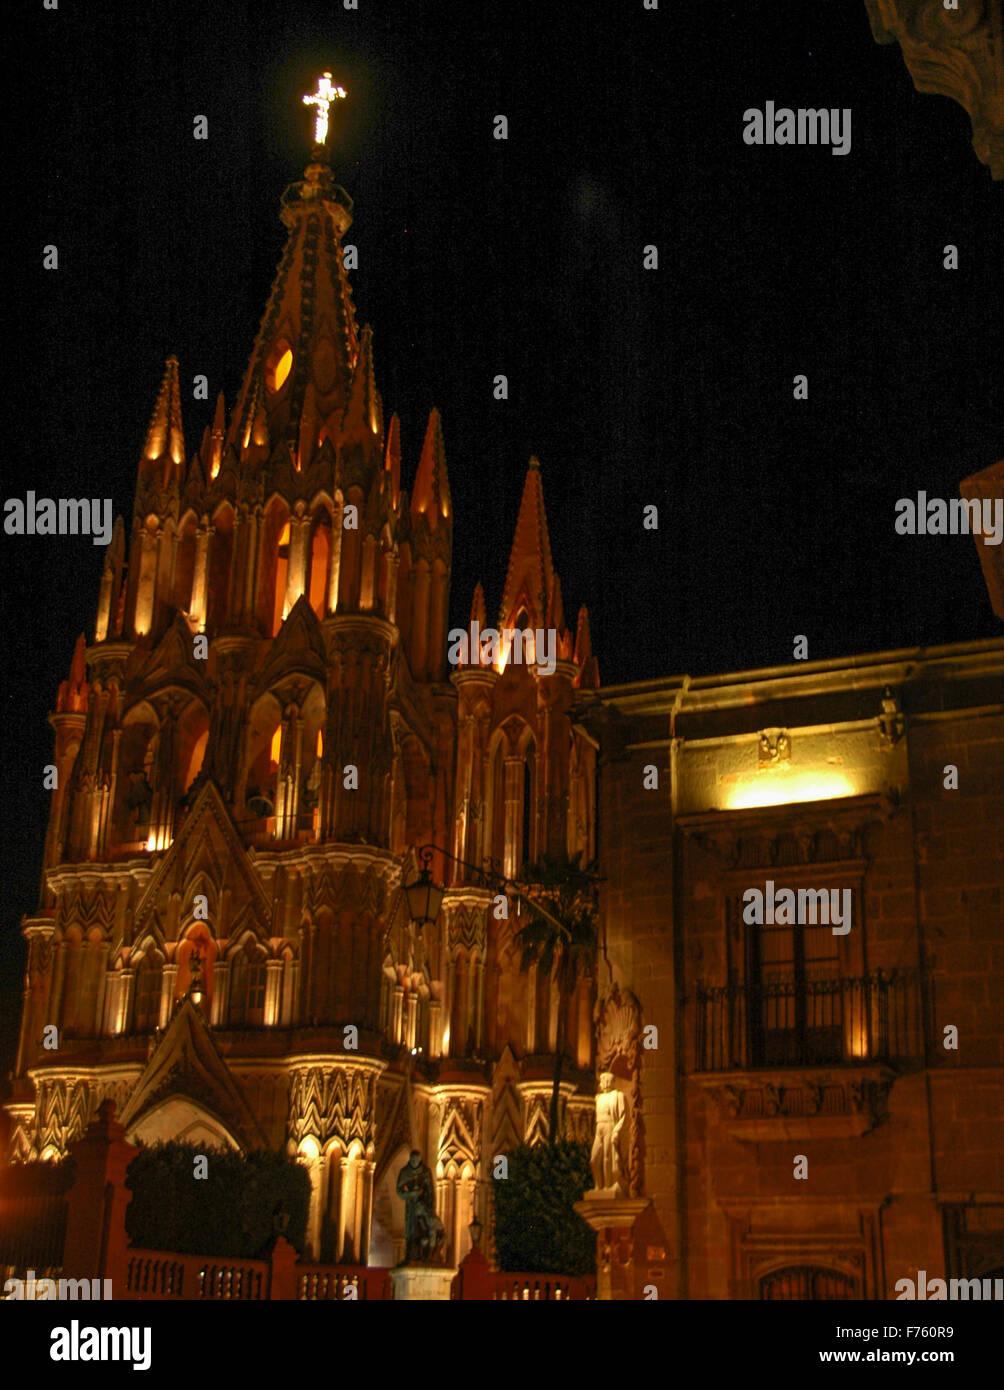 The Parroquia in San Miguel de Allende, Mexico Stock Photo